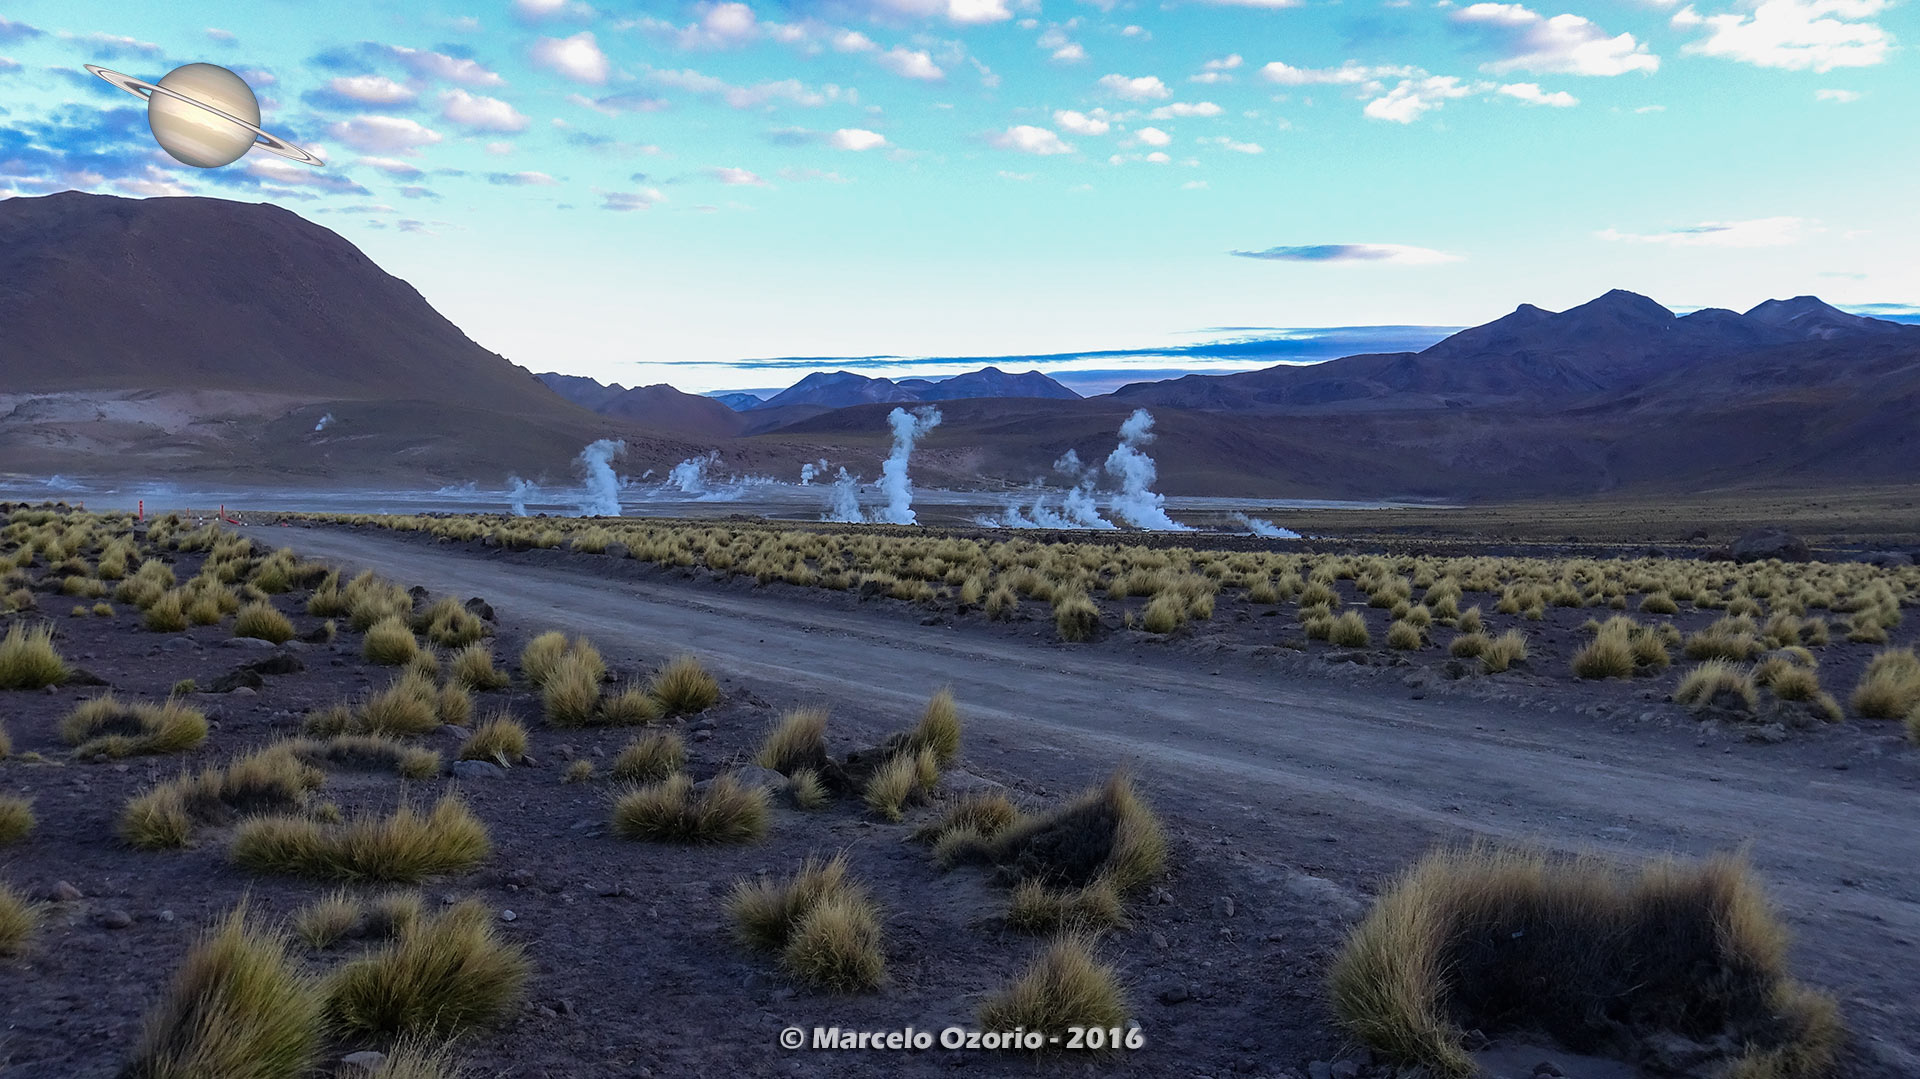 el tatio geysers atacama desert 41 - Os Surreais Gêiseres El Tatio - Deserto do Atacama - Chile